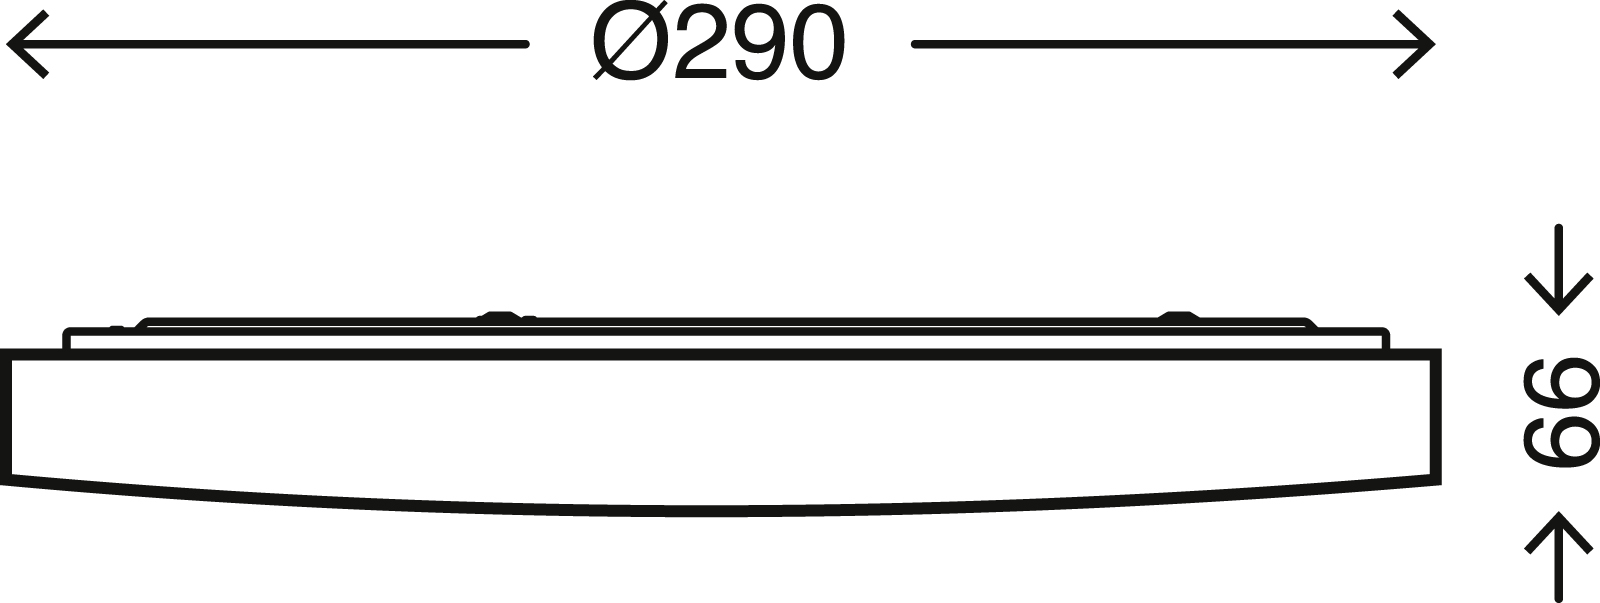 TELEFUNKEN Sensor LED Deckenleuchte, Ø 29 cm, 12 W, Weiss